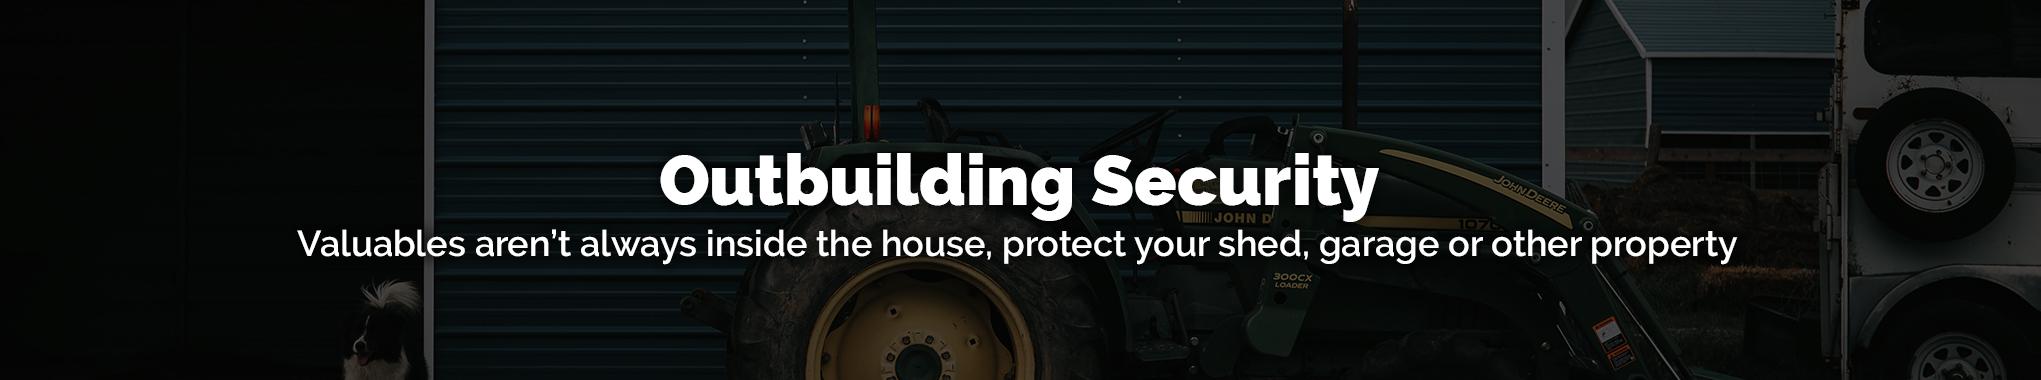 Outbuilding Security